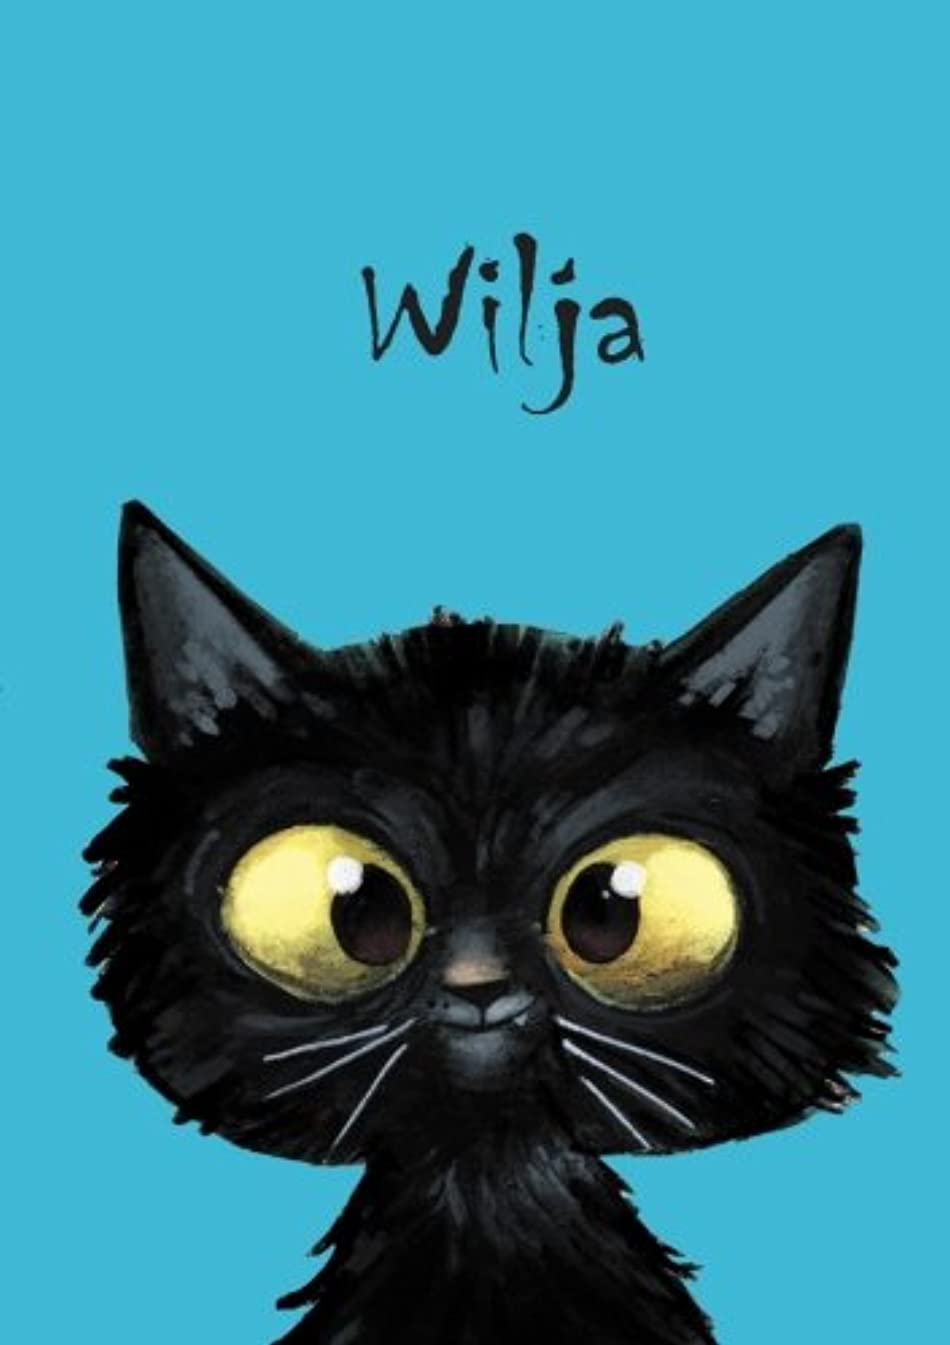 グリーンランド心理的確執Wilja: Wilja - Katzen - Malbuch / Notizbuch / Tagebuch: A5 - blanko